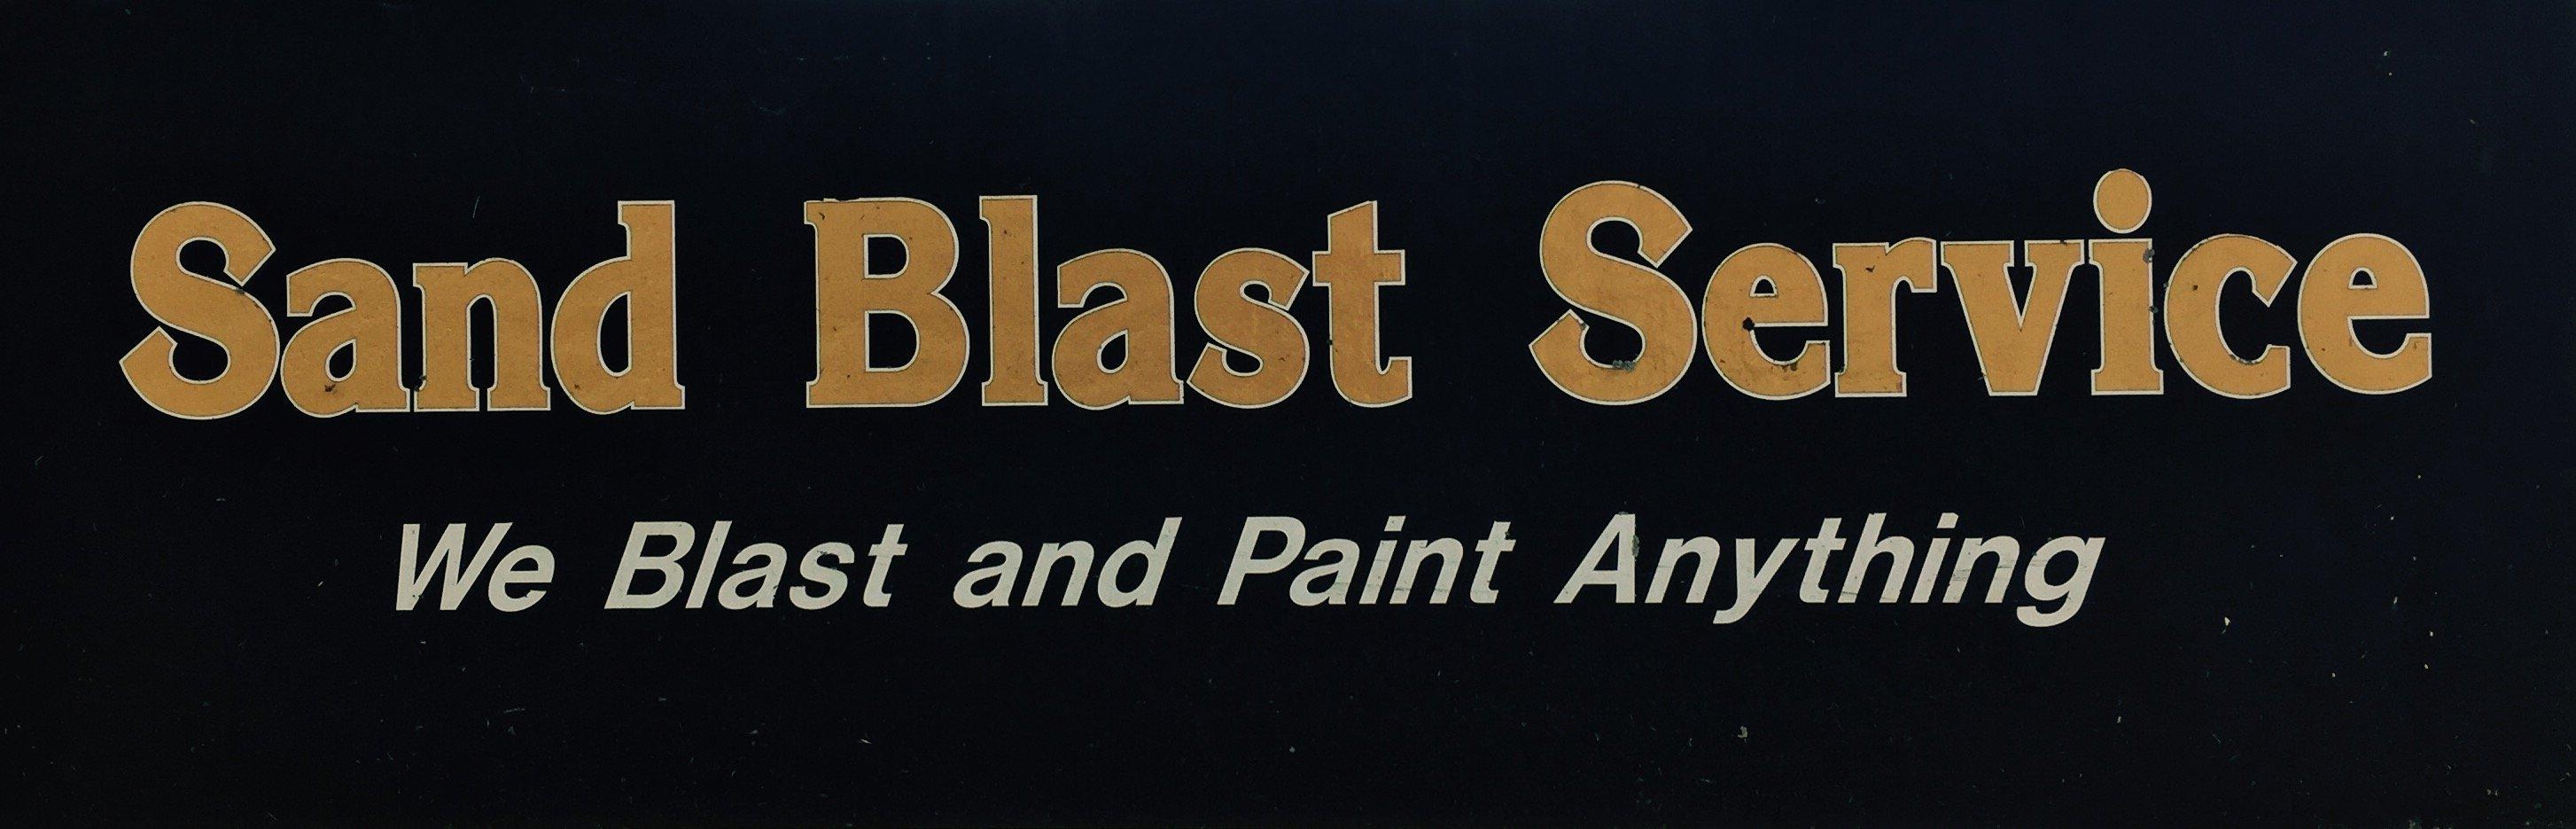 Sandblast Service logo